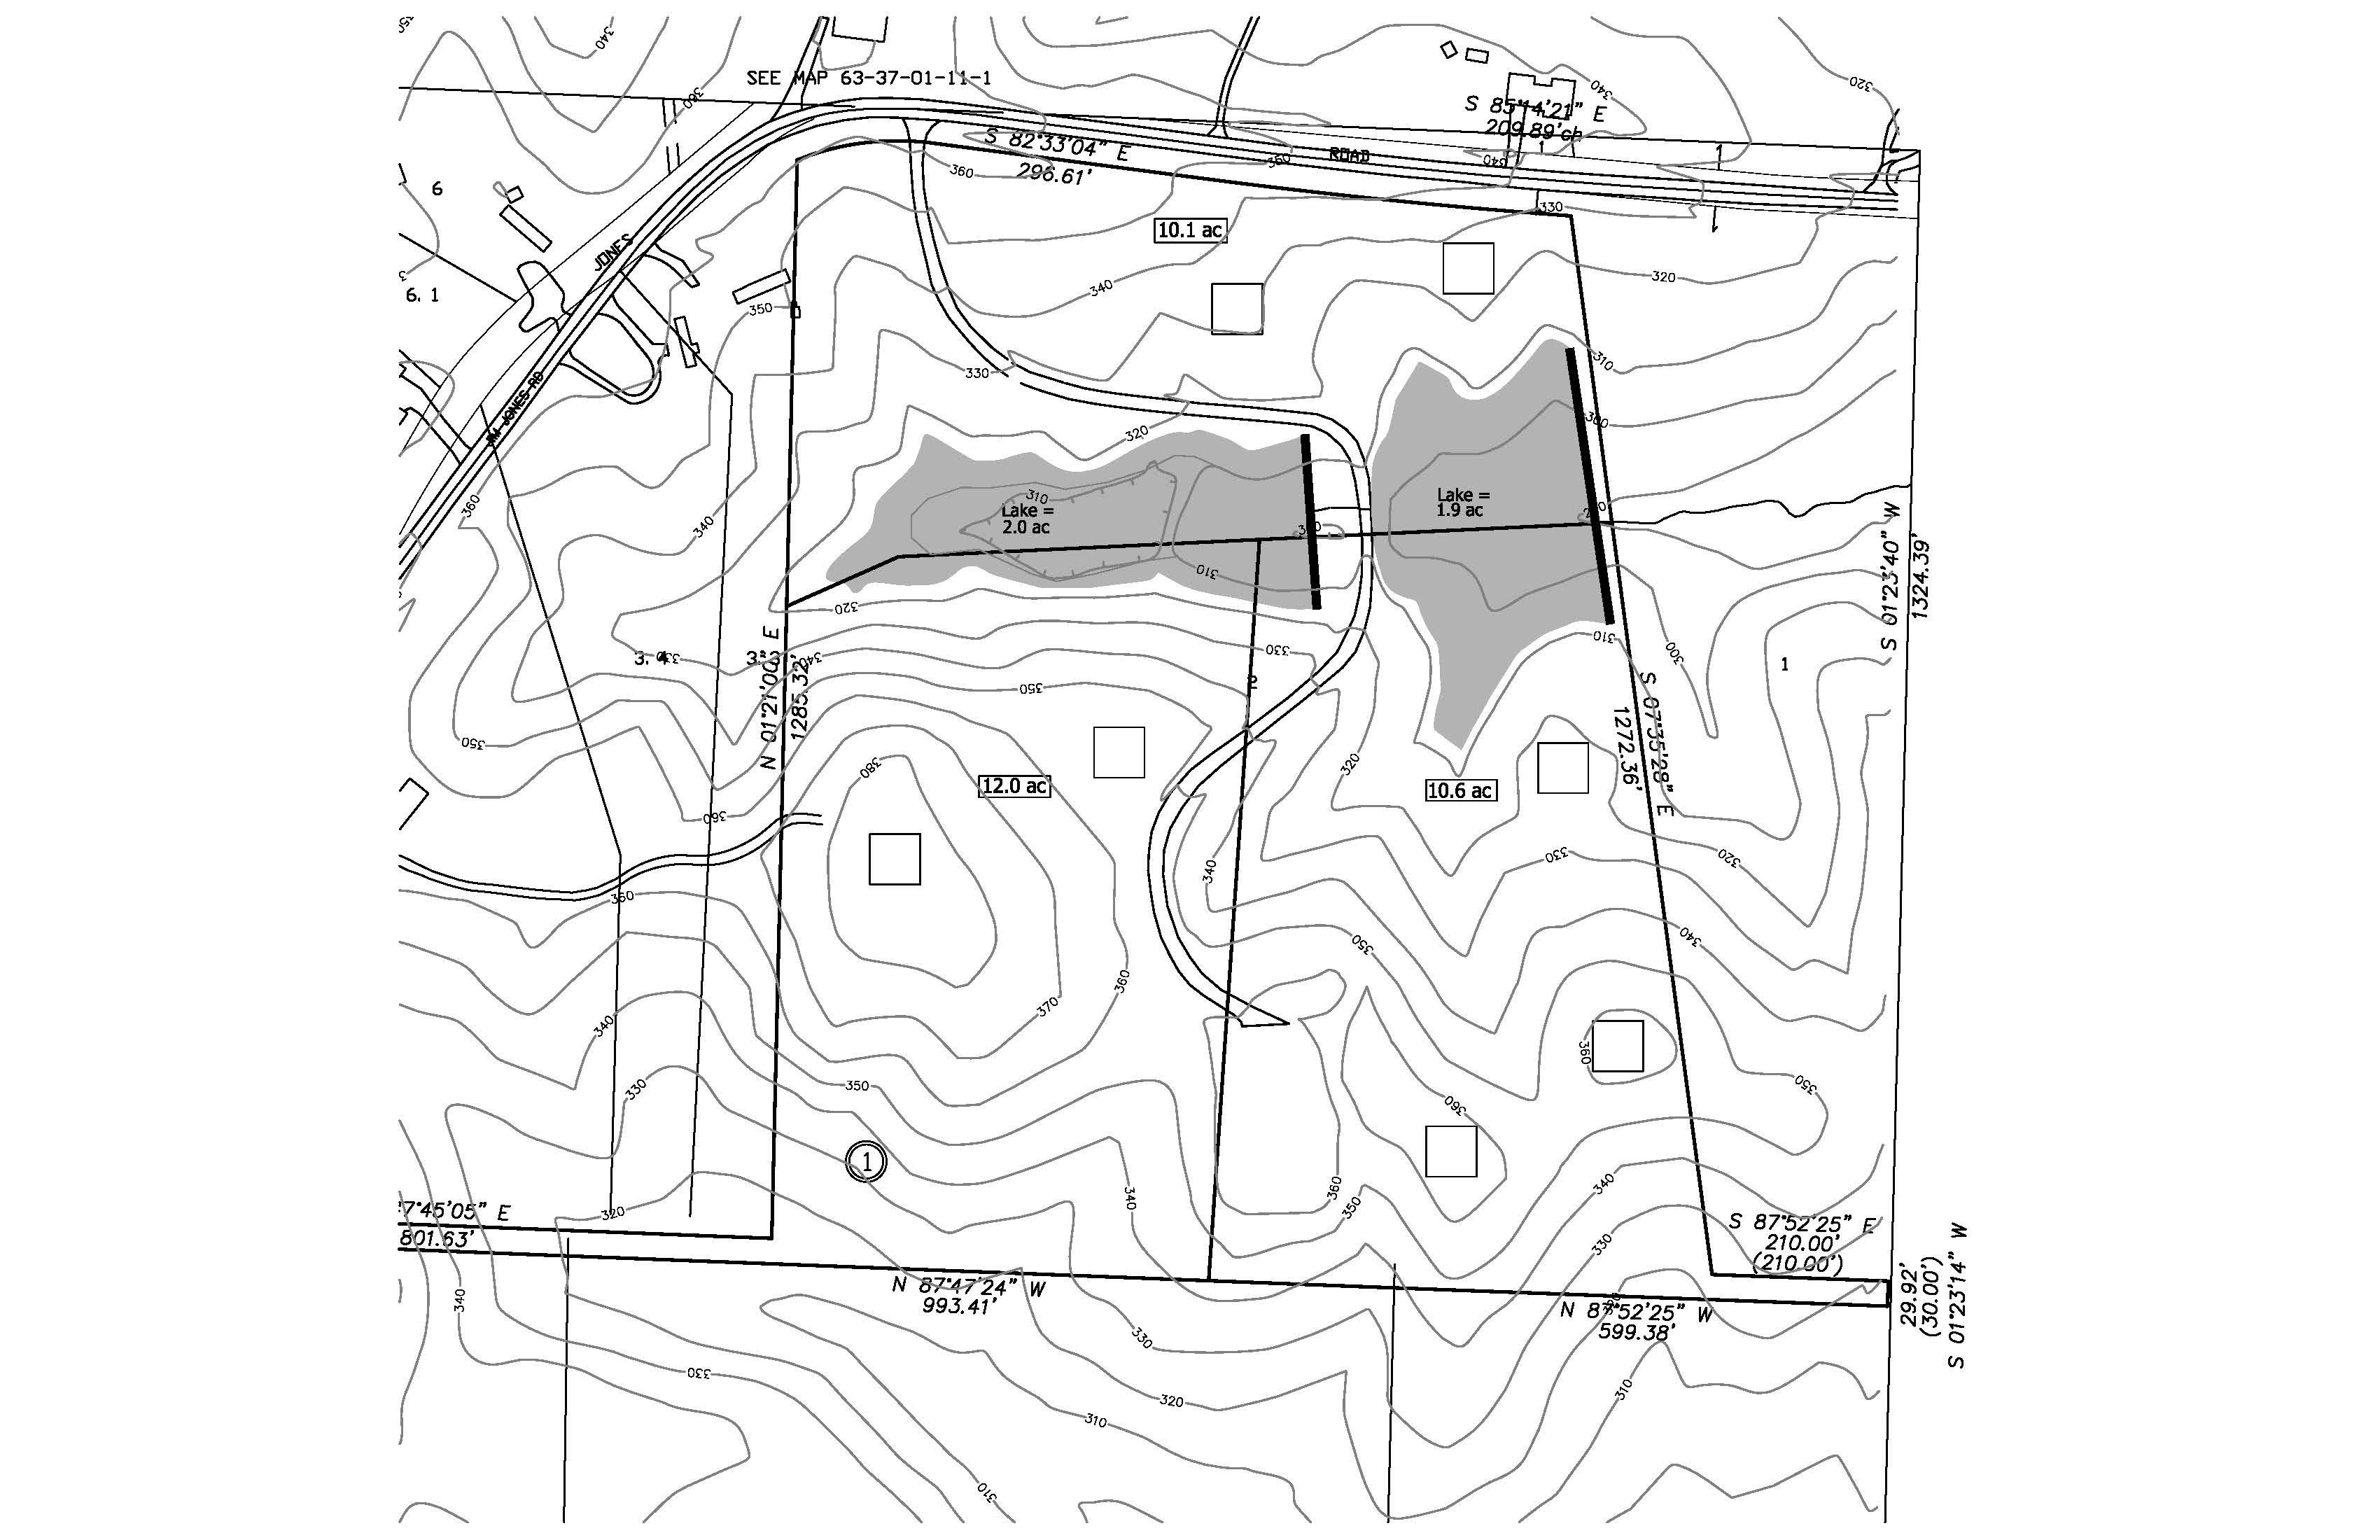 Jim Jones Road 10-foot contours